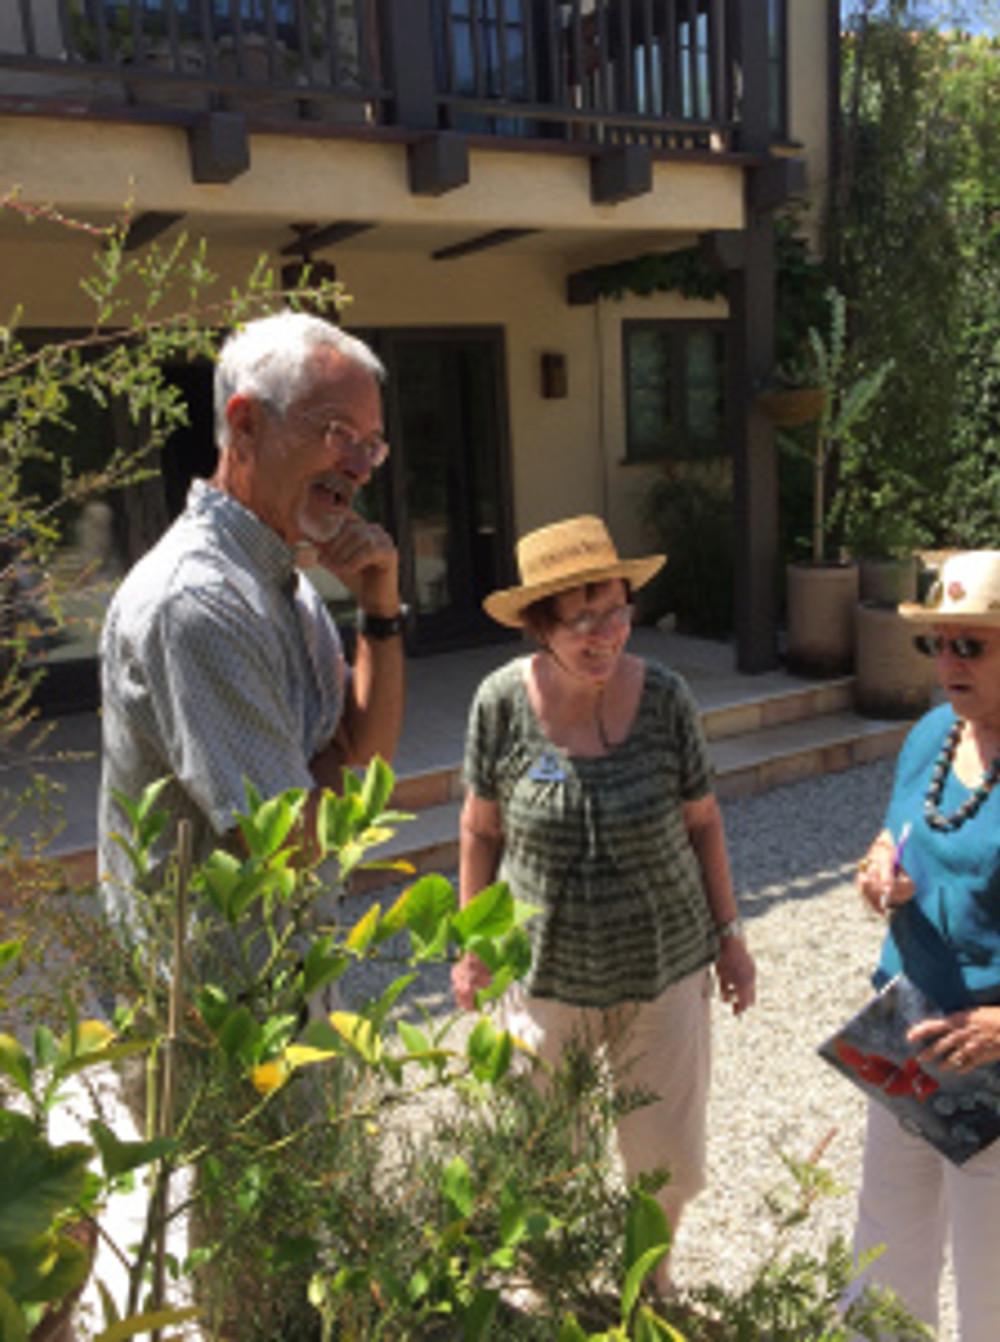 BAGSC members Steve Hampson, Rita Hopper and Leslie Walker discuss an interesting specimen in the back yard. Photo by Clara Josephs, © 2016.